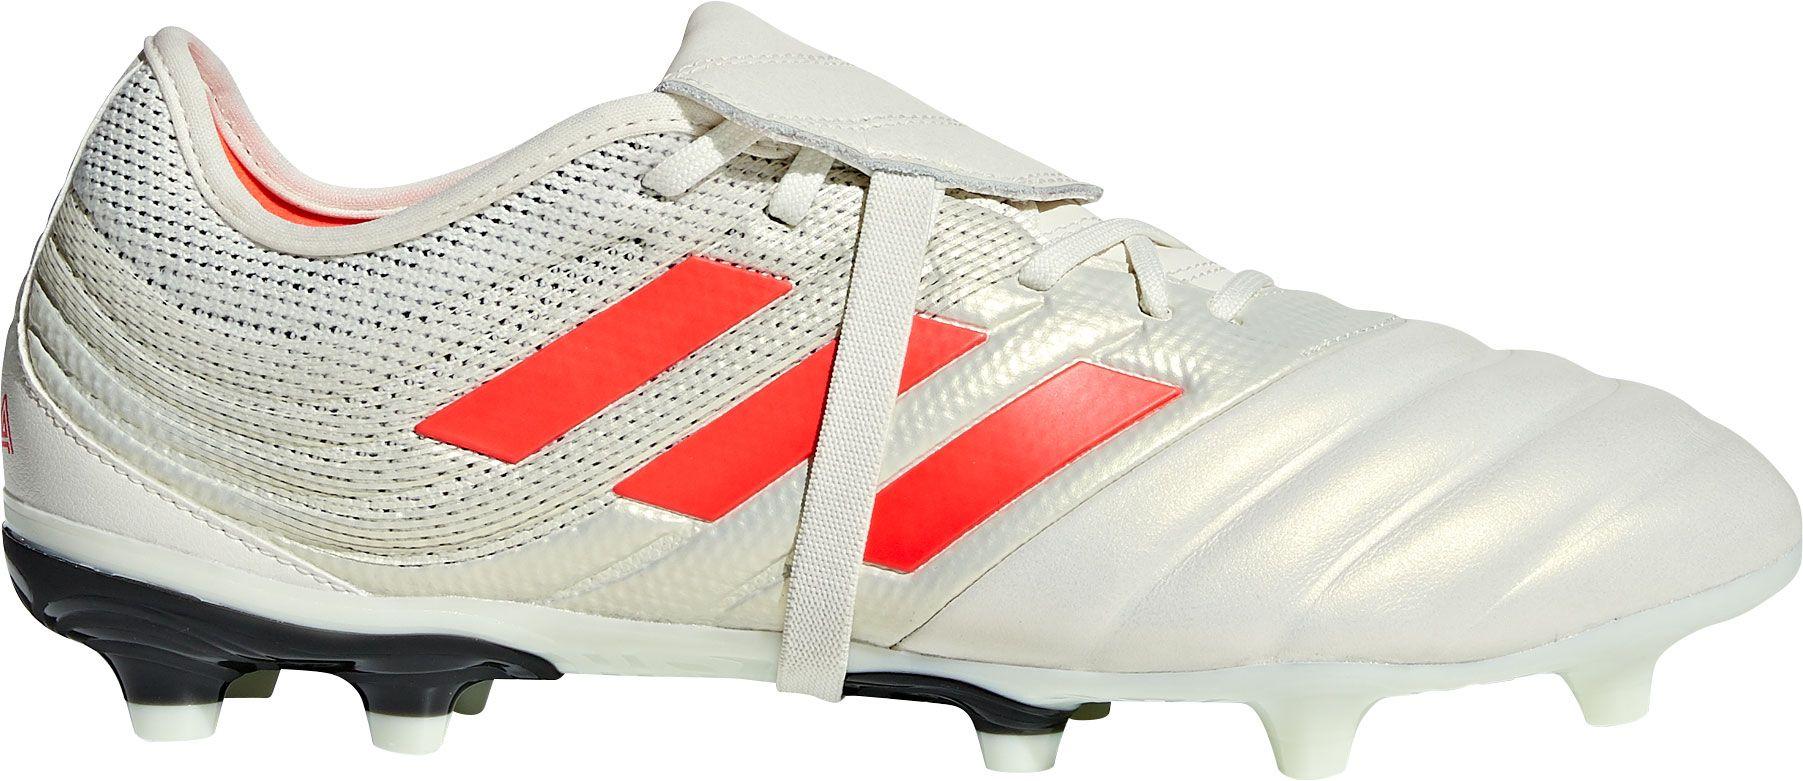 adidas Men's Copa Gloro 19.2 FG Soccer Cleats, Size: 7.0, White